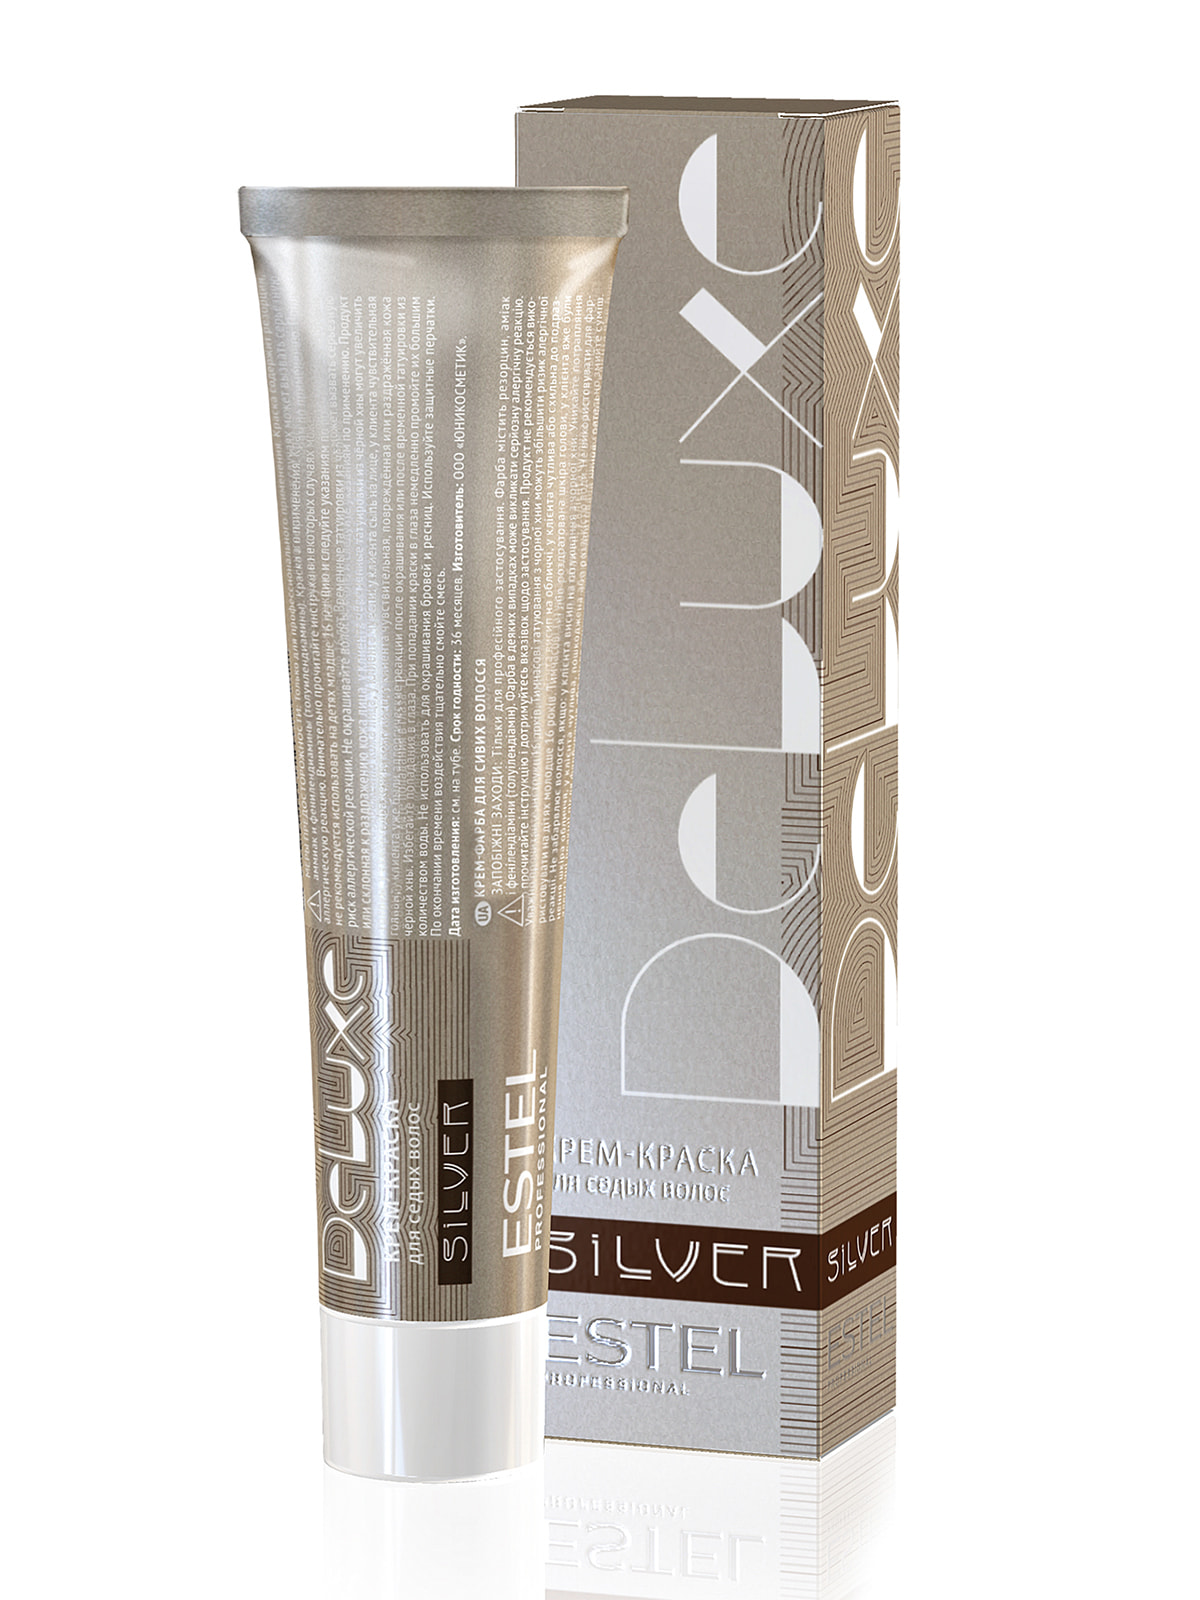 Крем-краска De Luxe Silver - русый медно-красный (60 мл) | 4693789 | фото 2